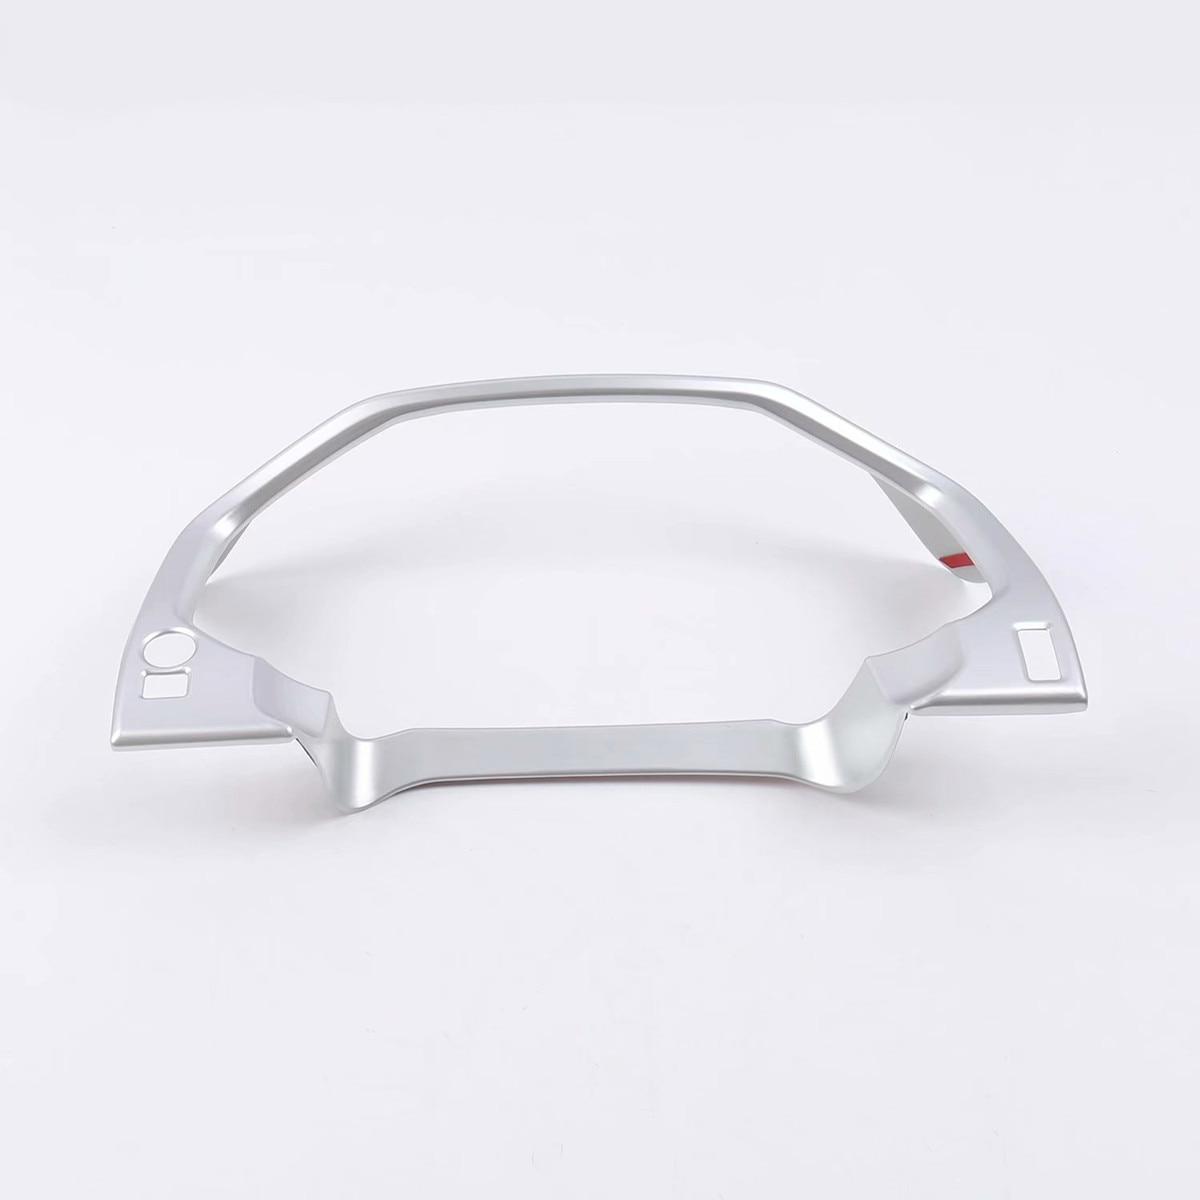 For Toyota Land Cruiser Prado 150 2018 FJ150 ABS Chrome Car Dashboard Decorative Cover Accessories